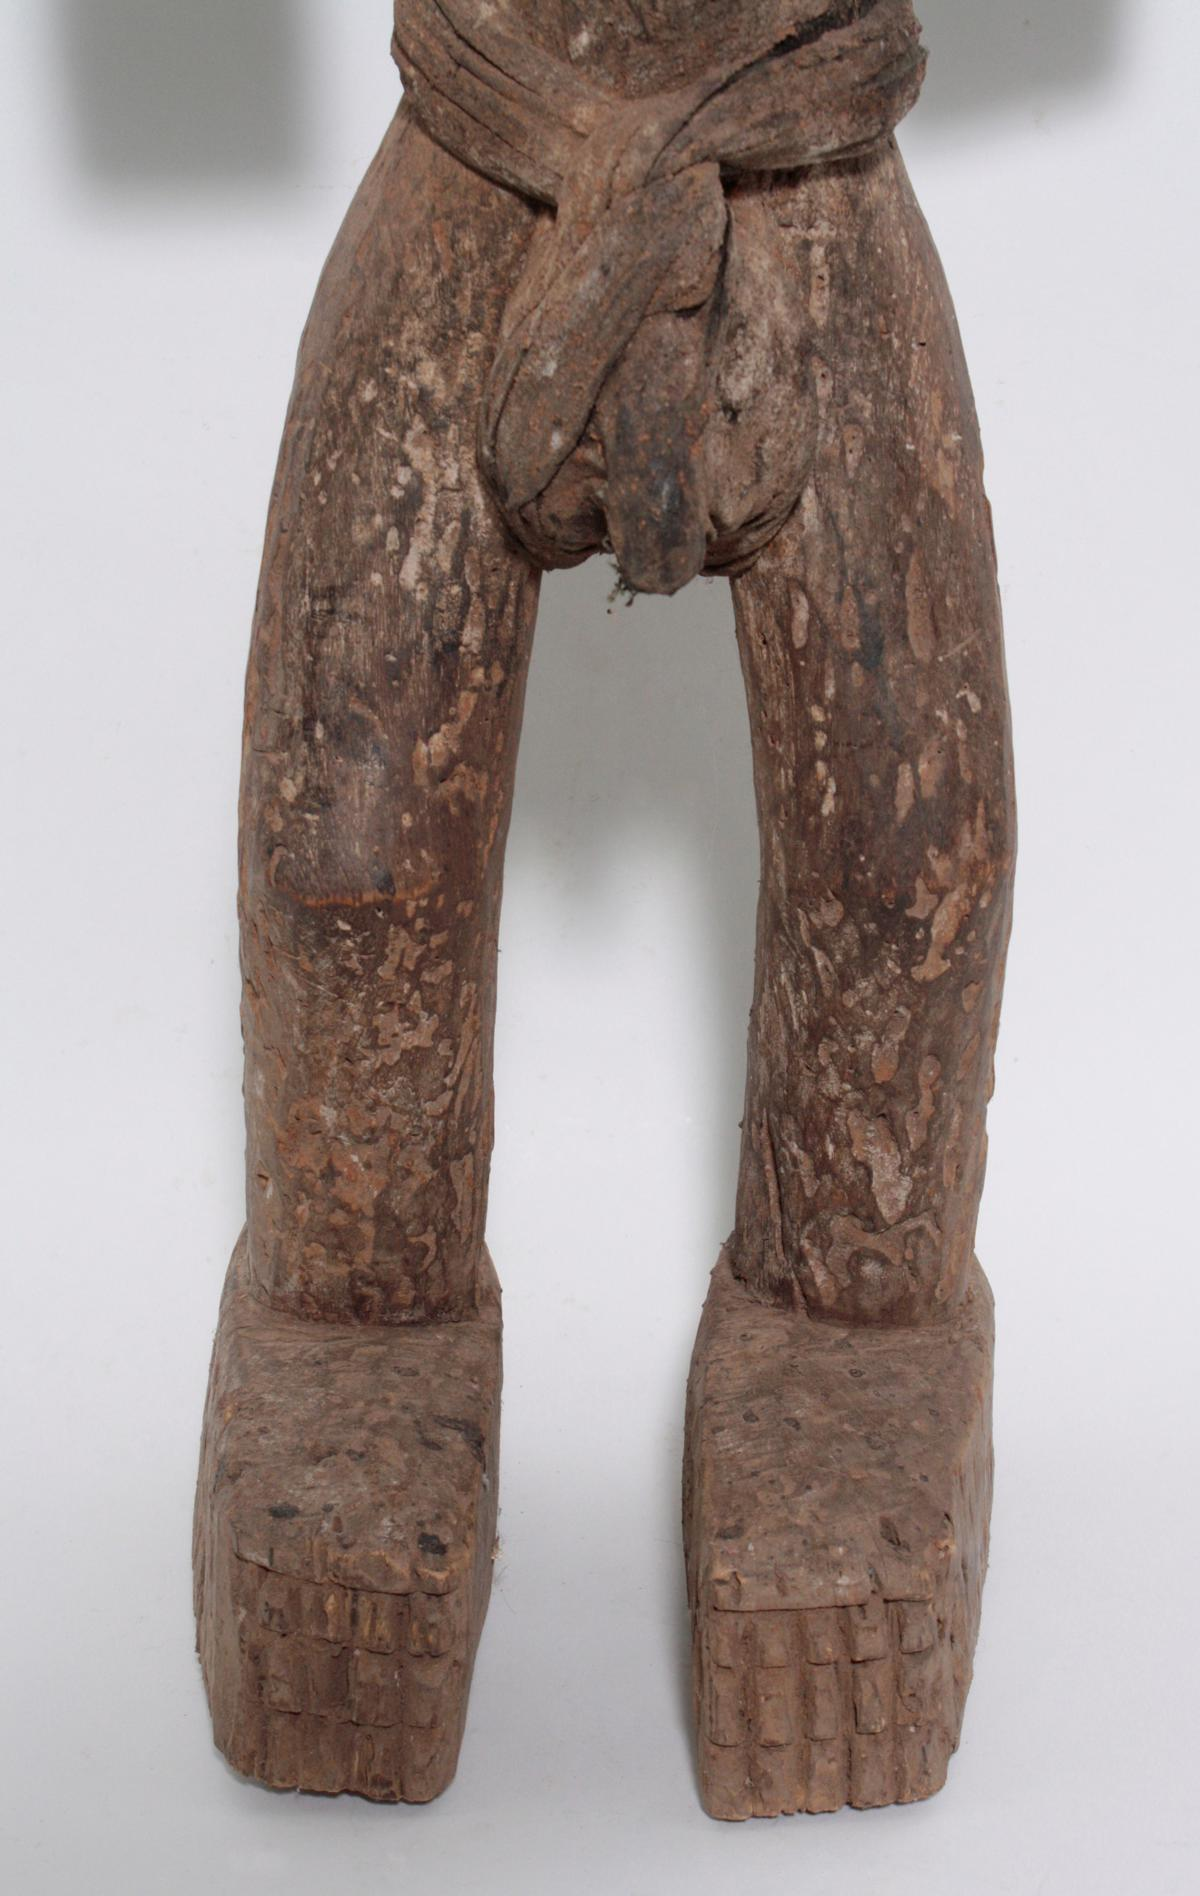 Ältere Große Figur, Dogon oder Bambara, Mali-4